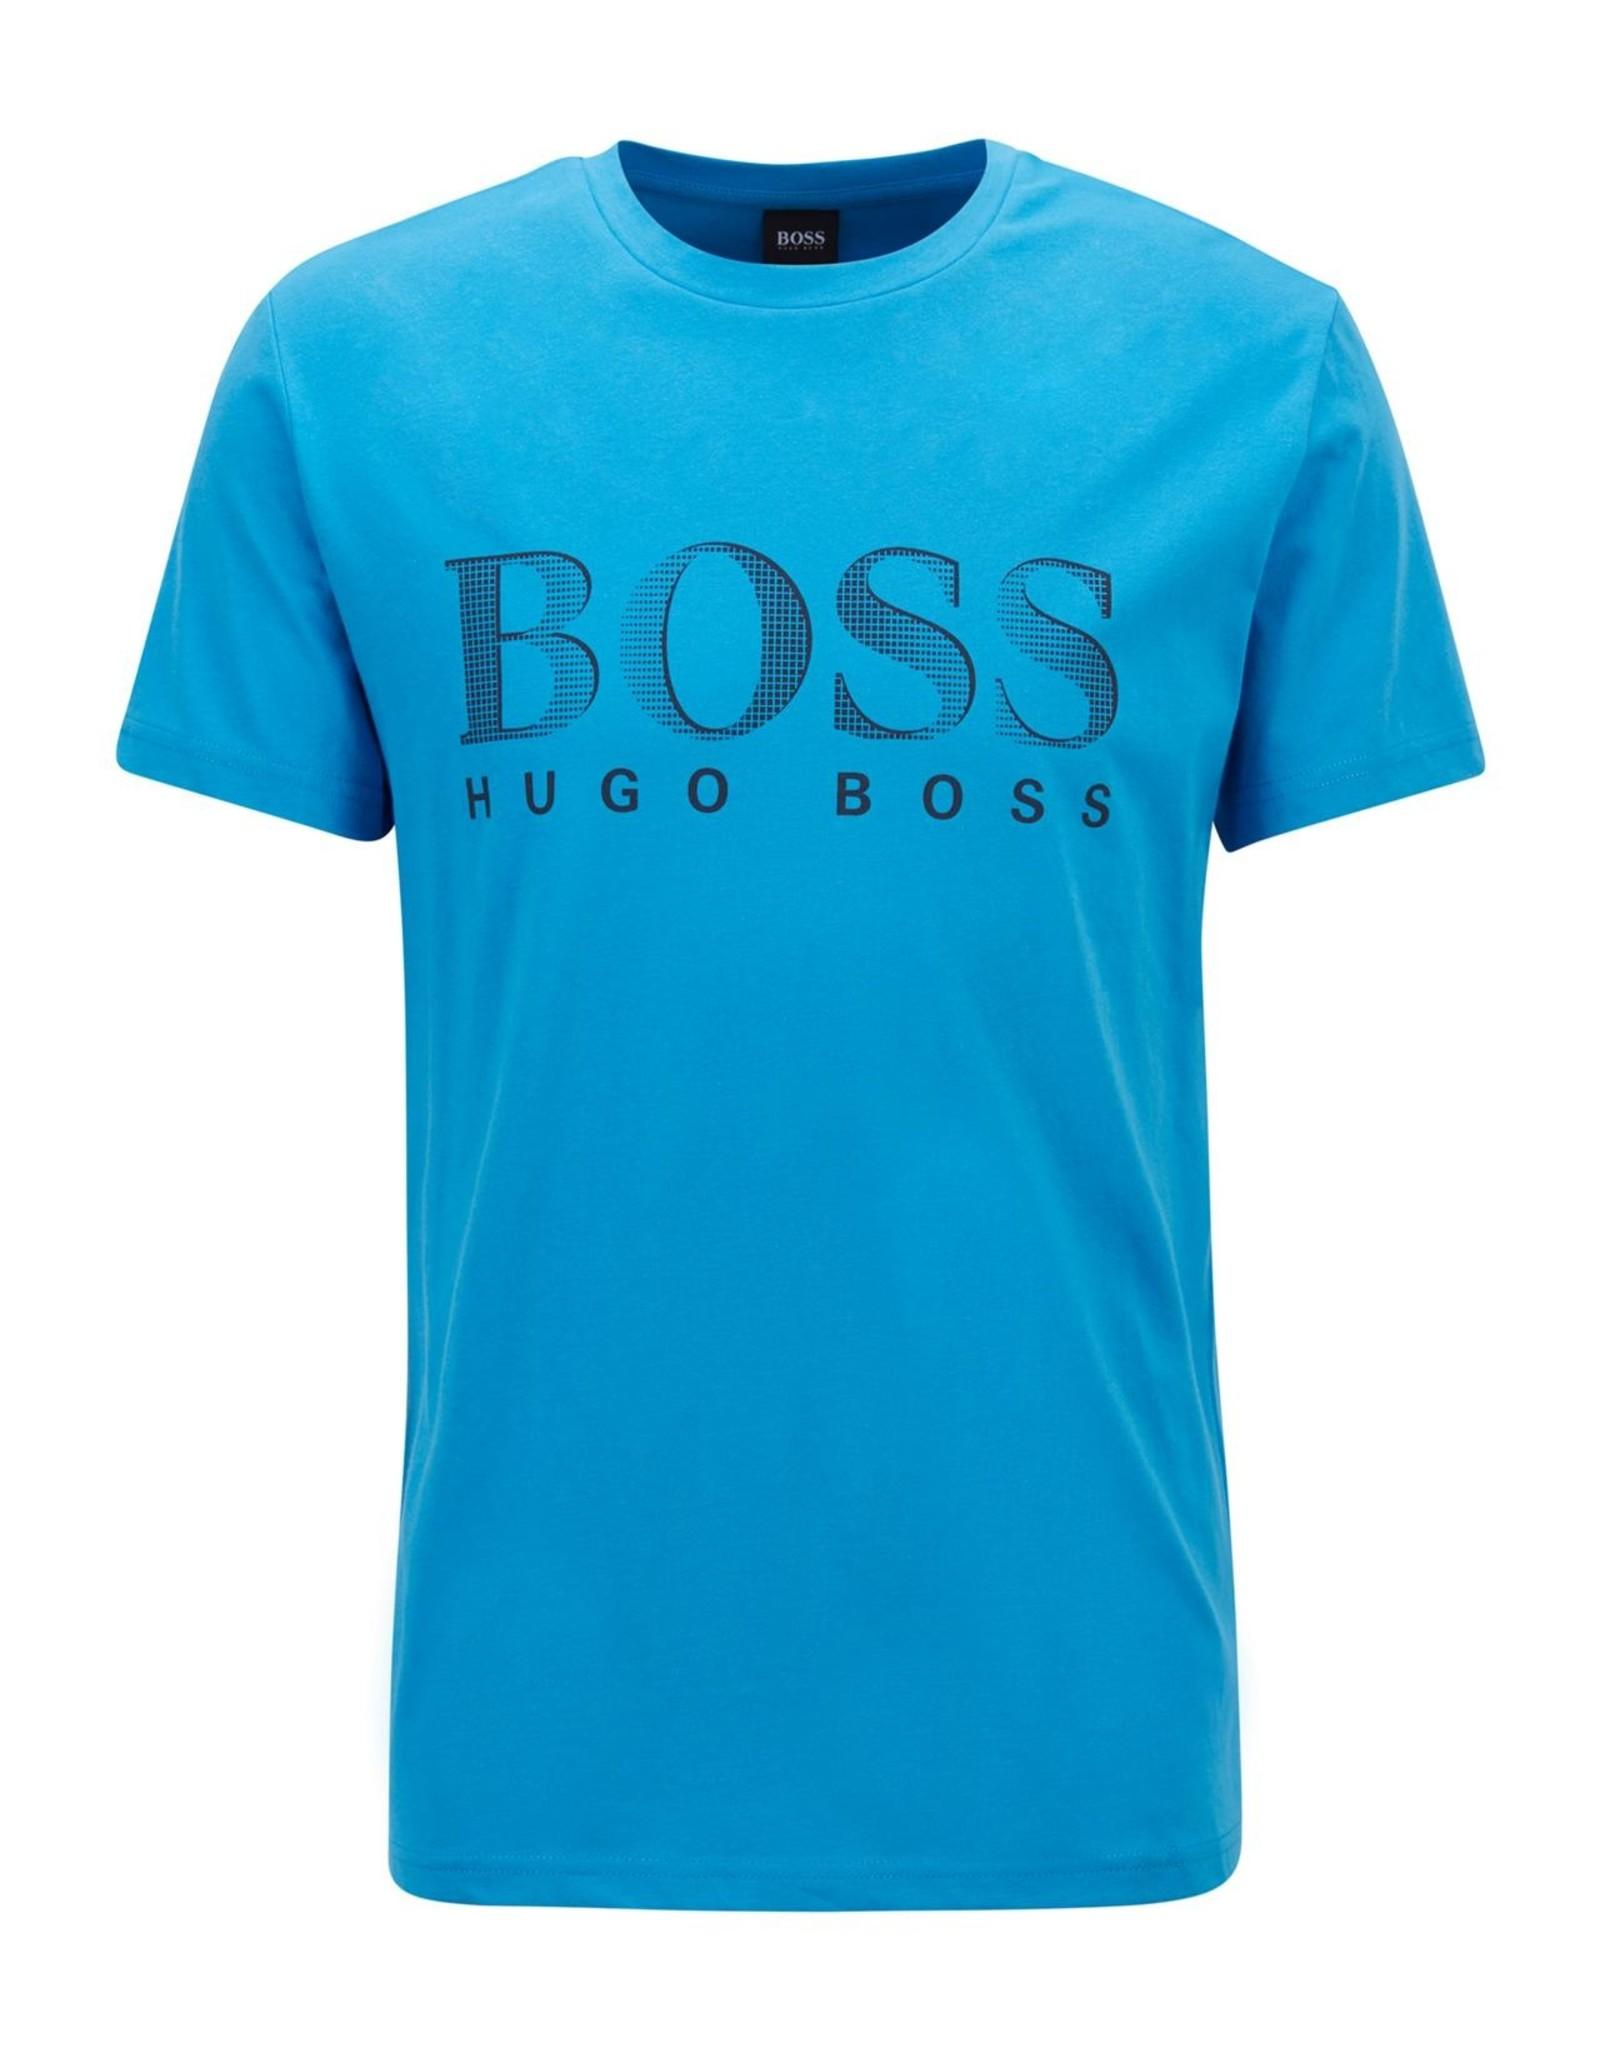 Hugo Boss Hugo Boss Beach T-Shirt